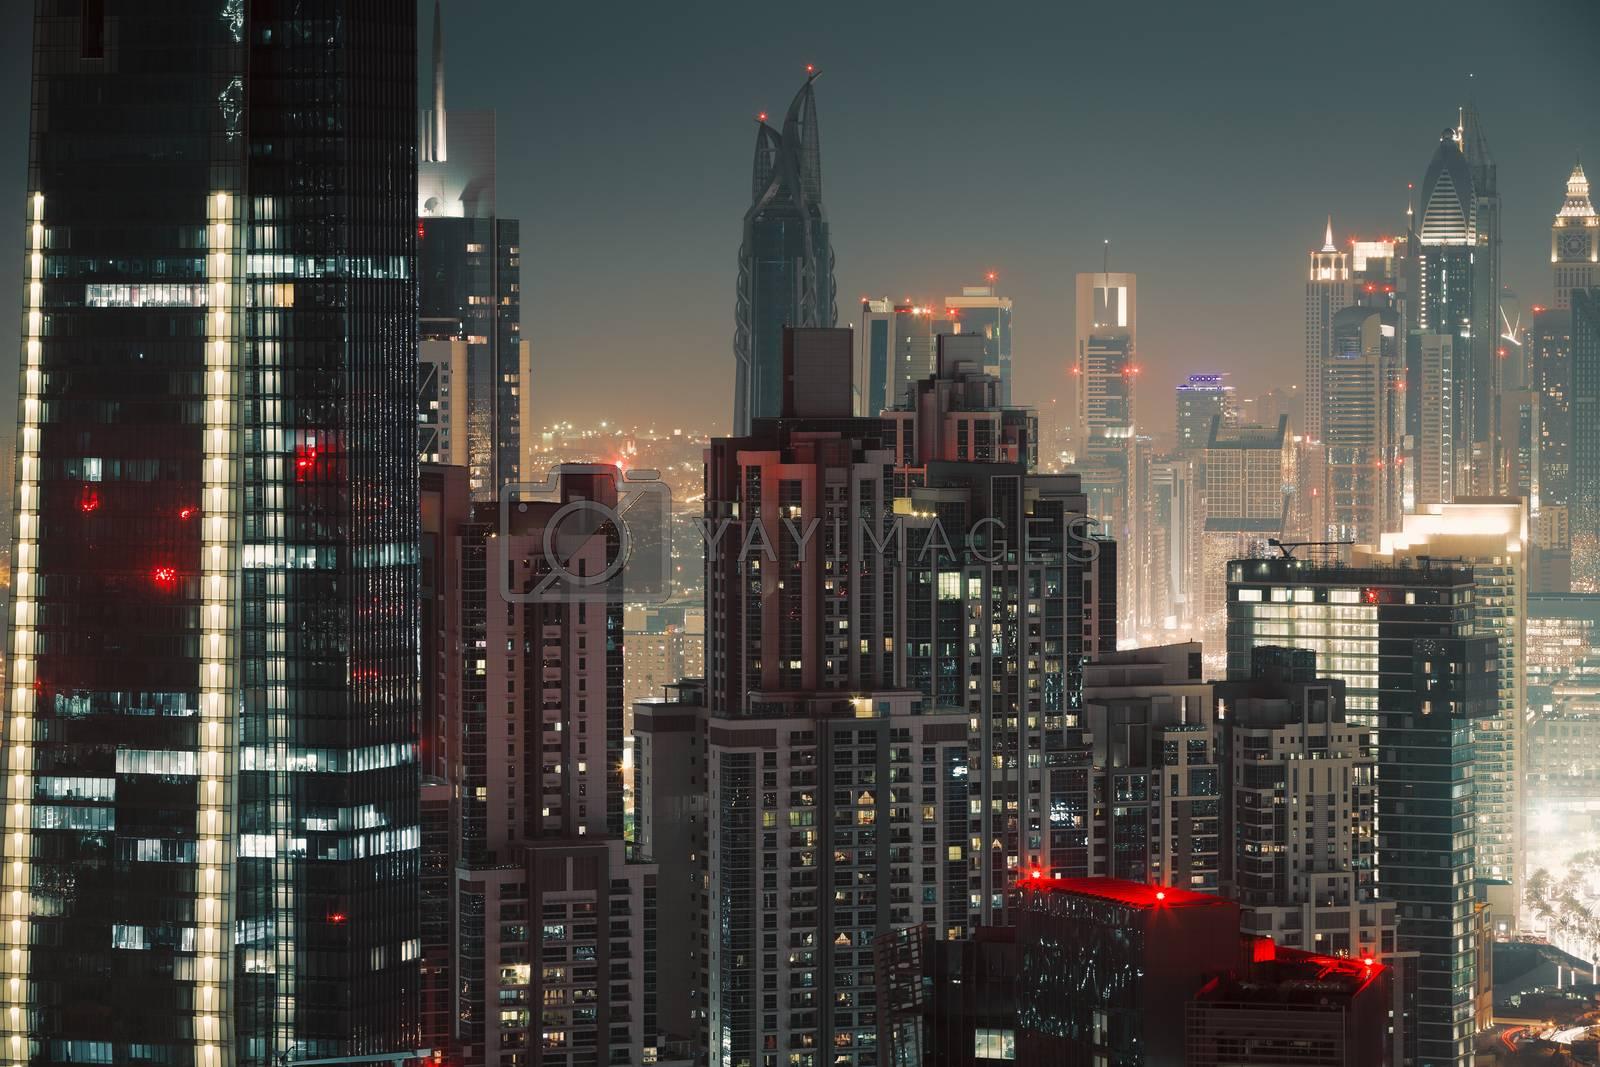 Beautiful Dubai Night Scene Background. Lights of Skyscrapers at Nighttime. Luxury Property. Middle East Travel Destination. United Arab Emirate